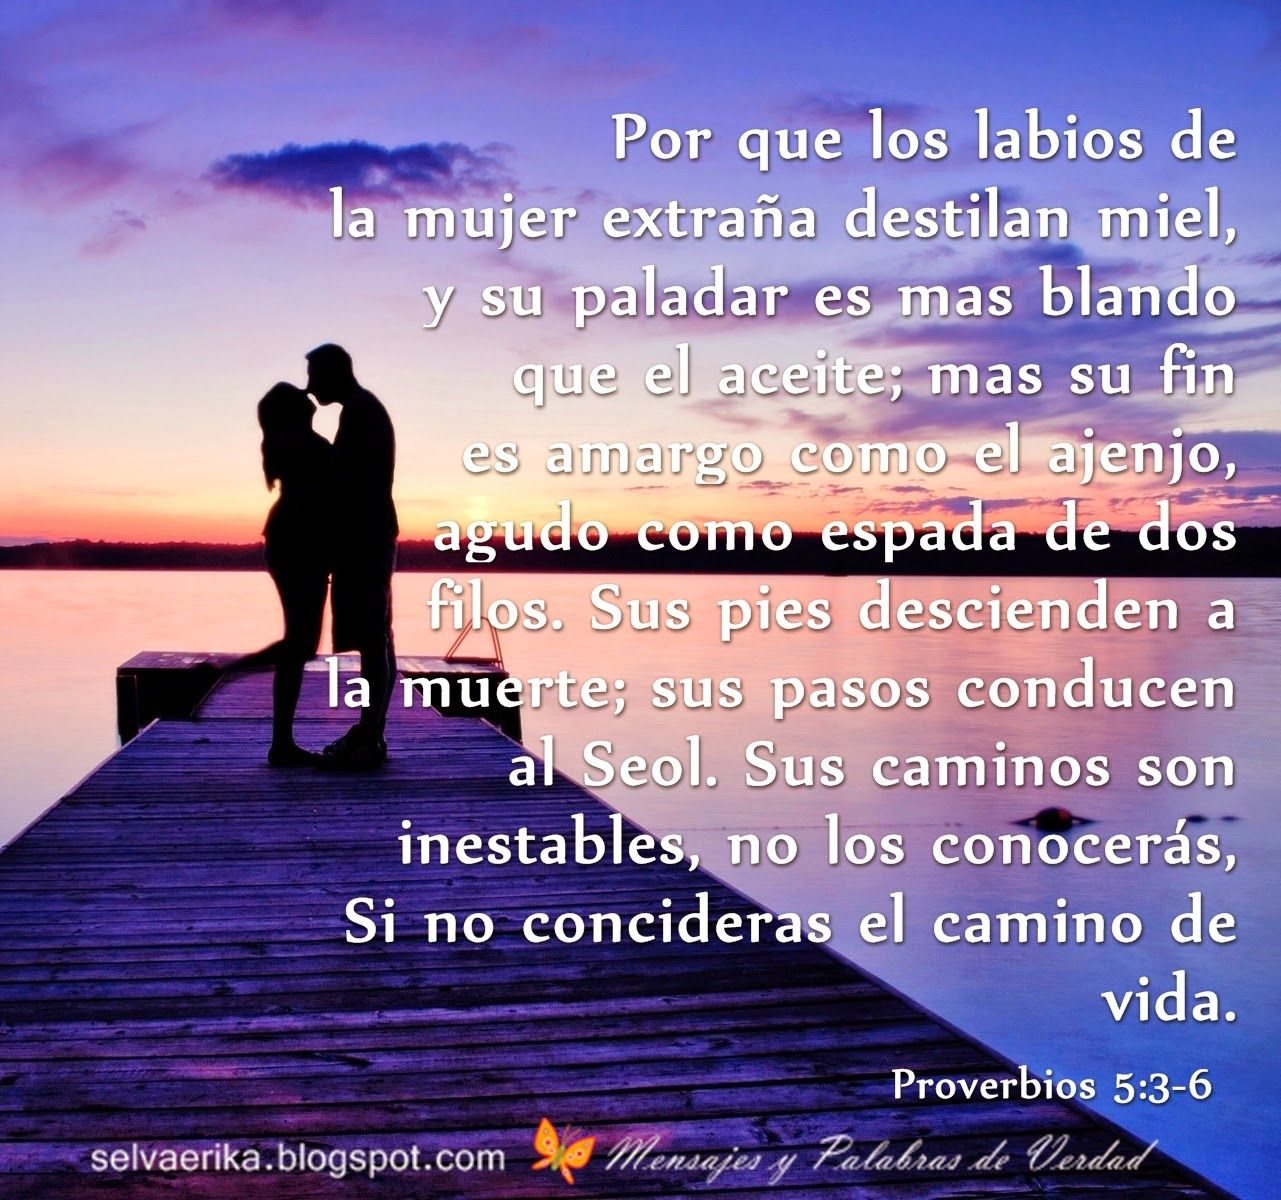 Pablo Matrimonio Biblia : Amor y respeto palabras claves para un bello matrimonio